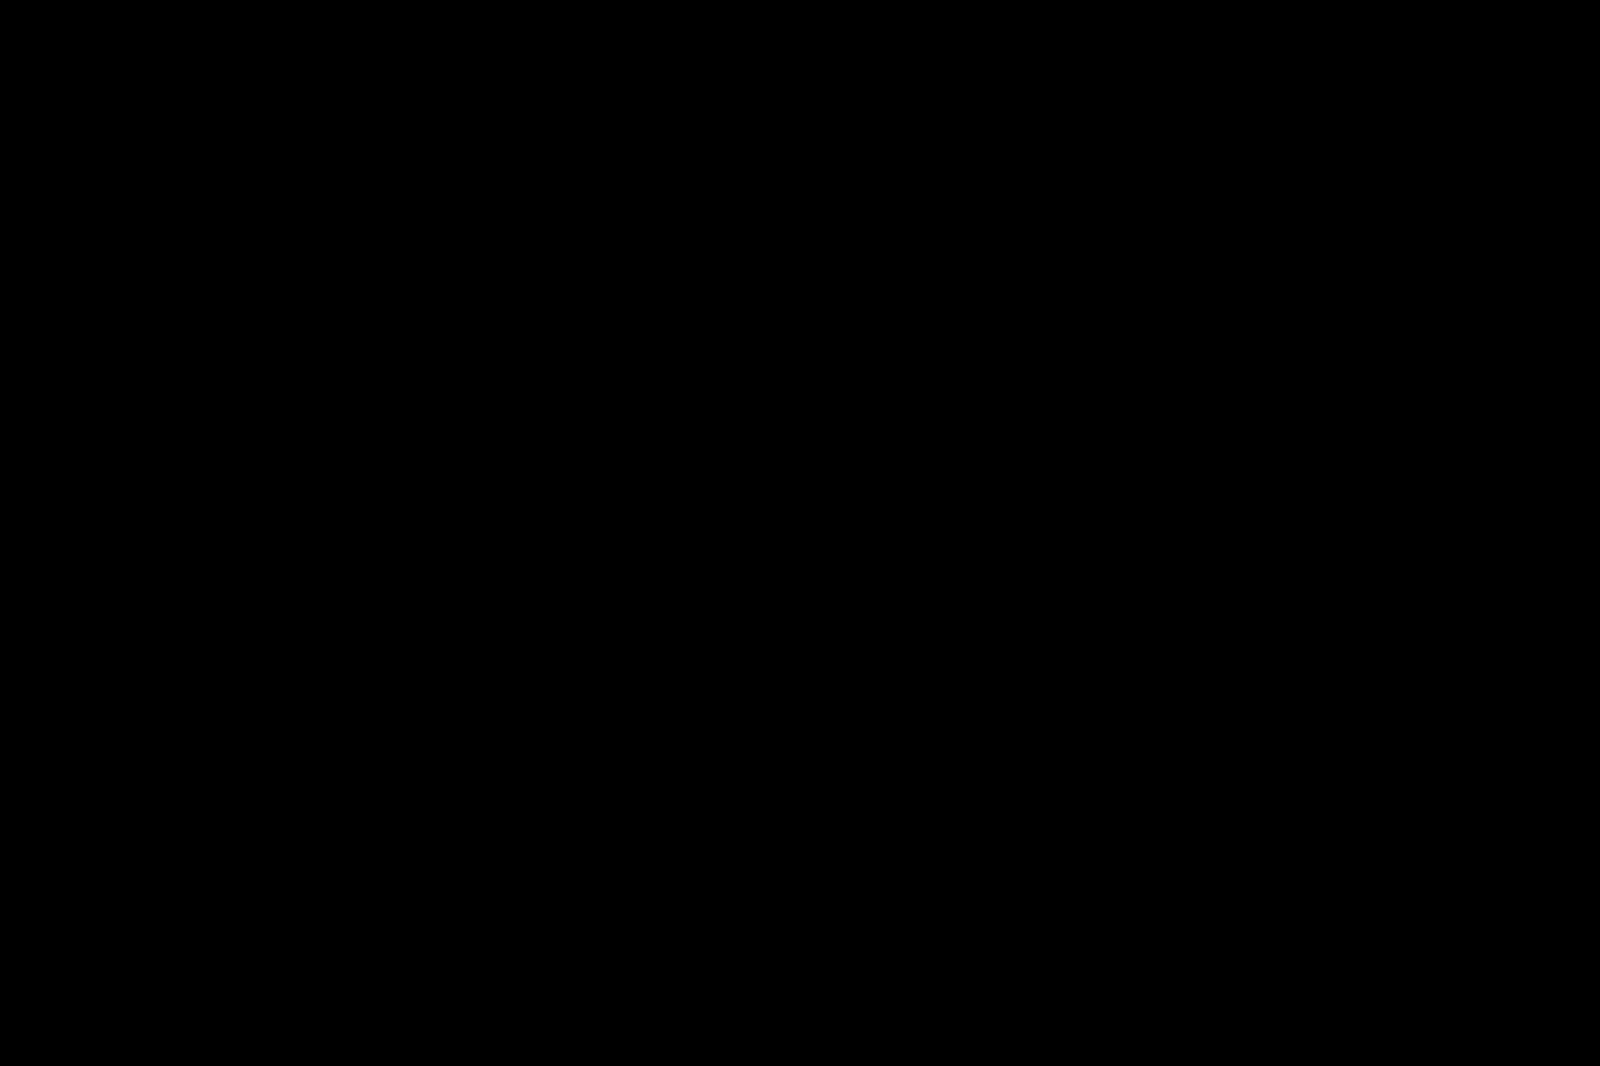 5. SegelBundesLiga Event im sonnigen Kiel